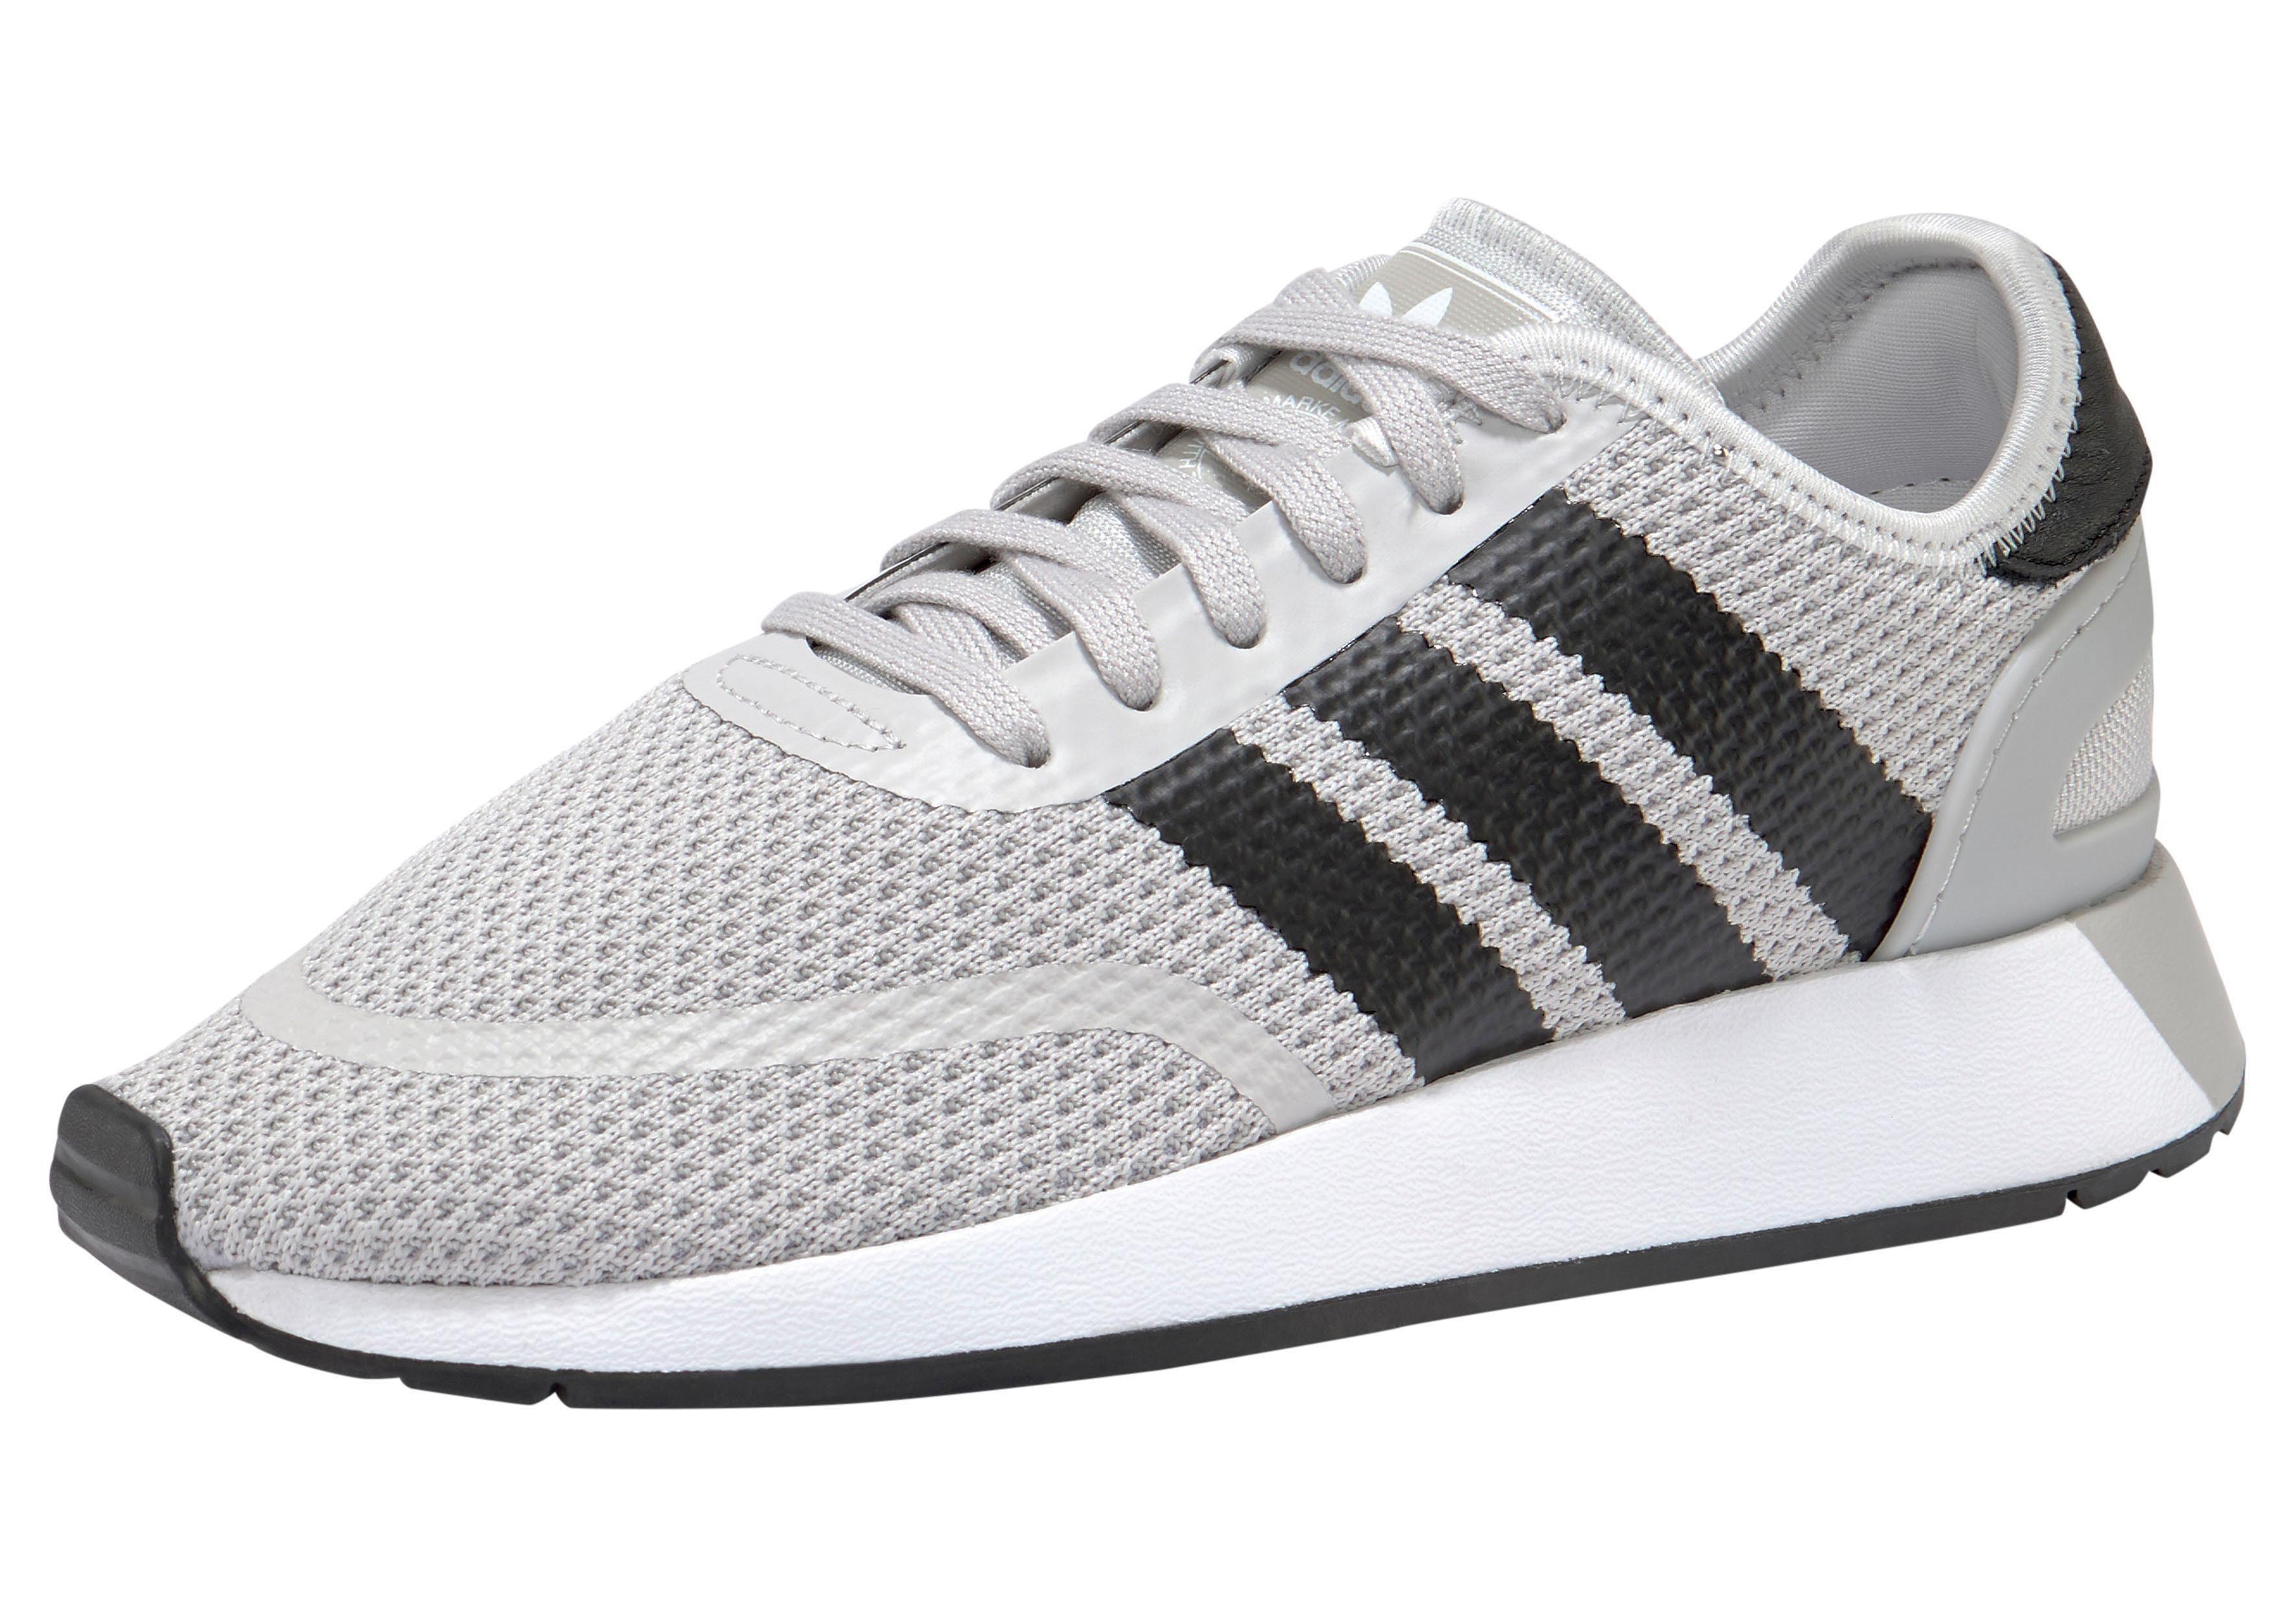 adidas Damen Sneaker Low N 5923